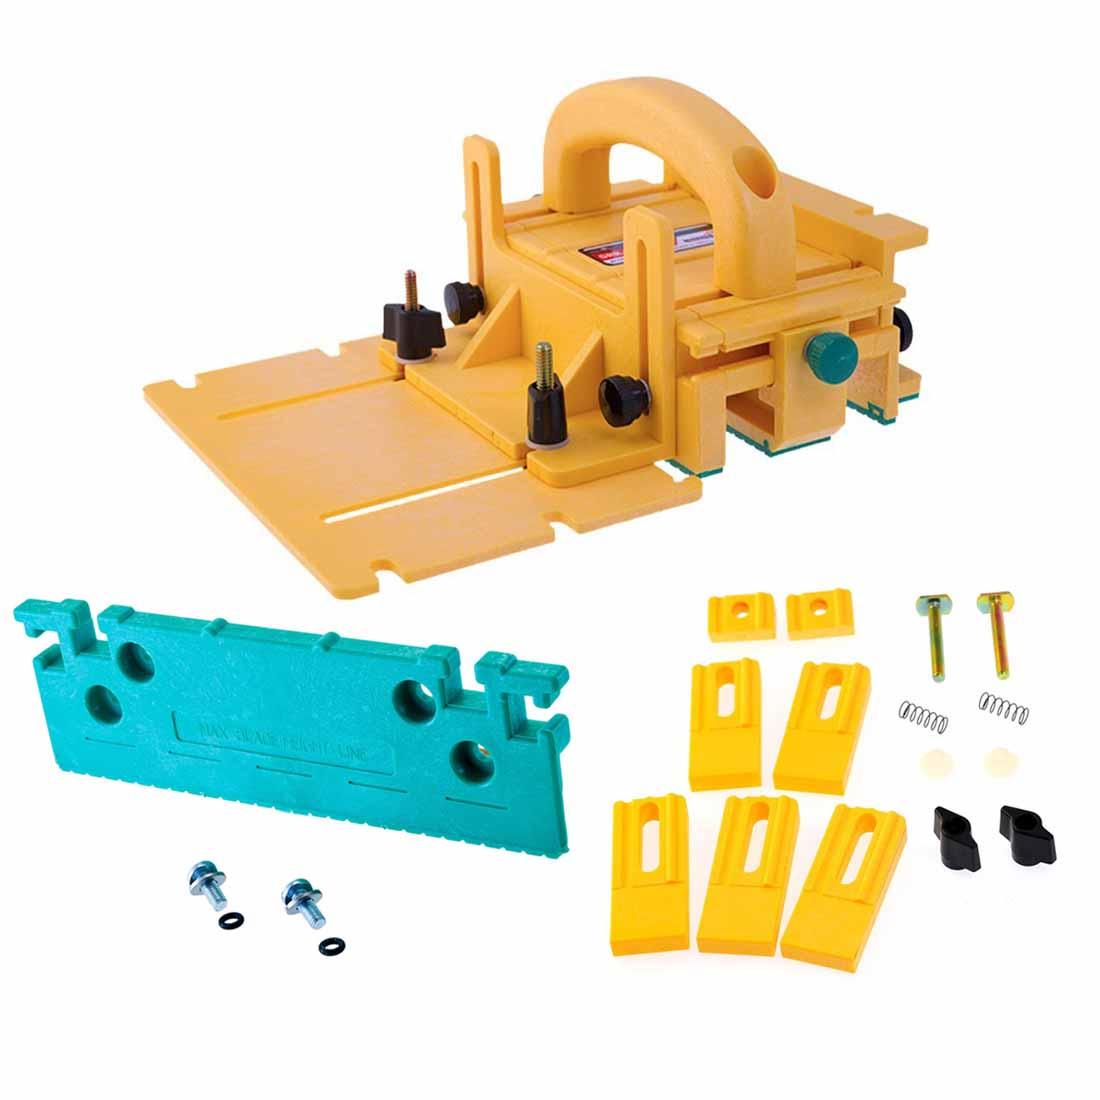 Microjig Grr-Ripper Advanced 3D Pushblock with 1/8-Inch Leg & Gravity Heel Kit